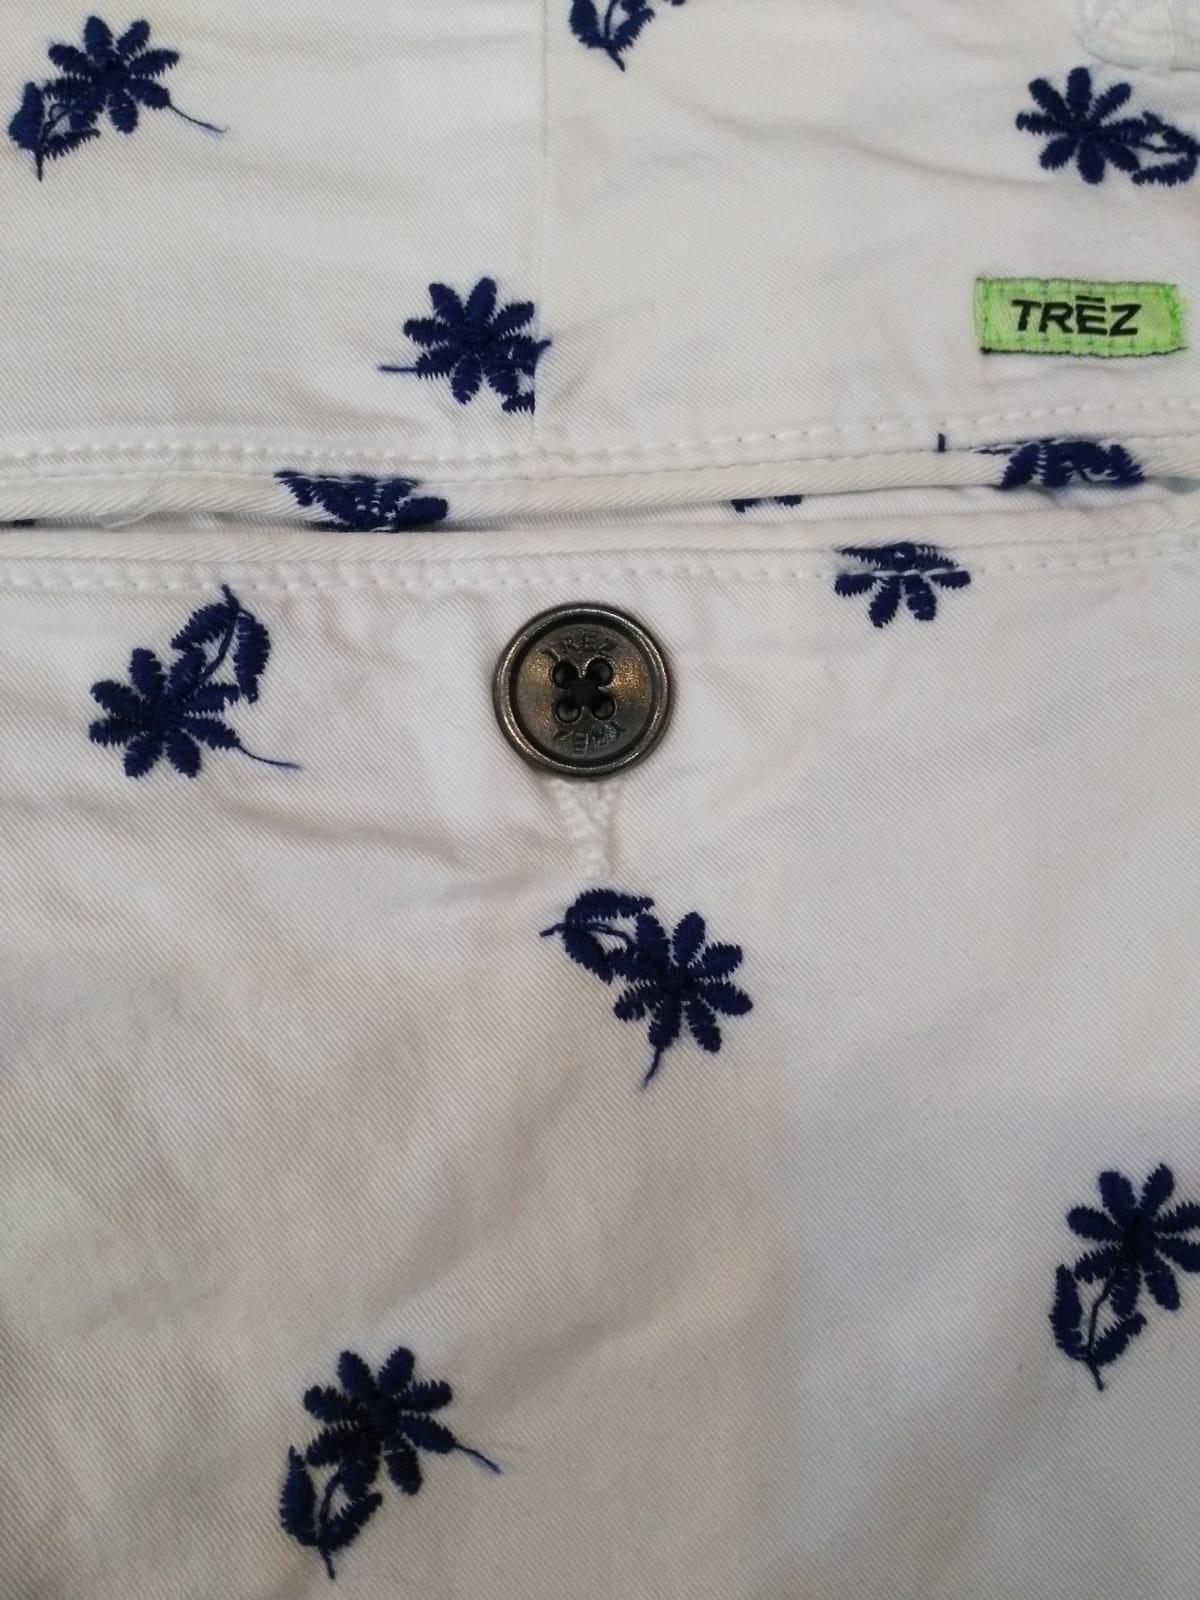 BERMUDA TREZ BASE - BIANCO